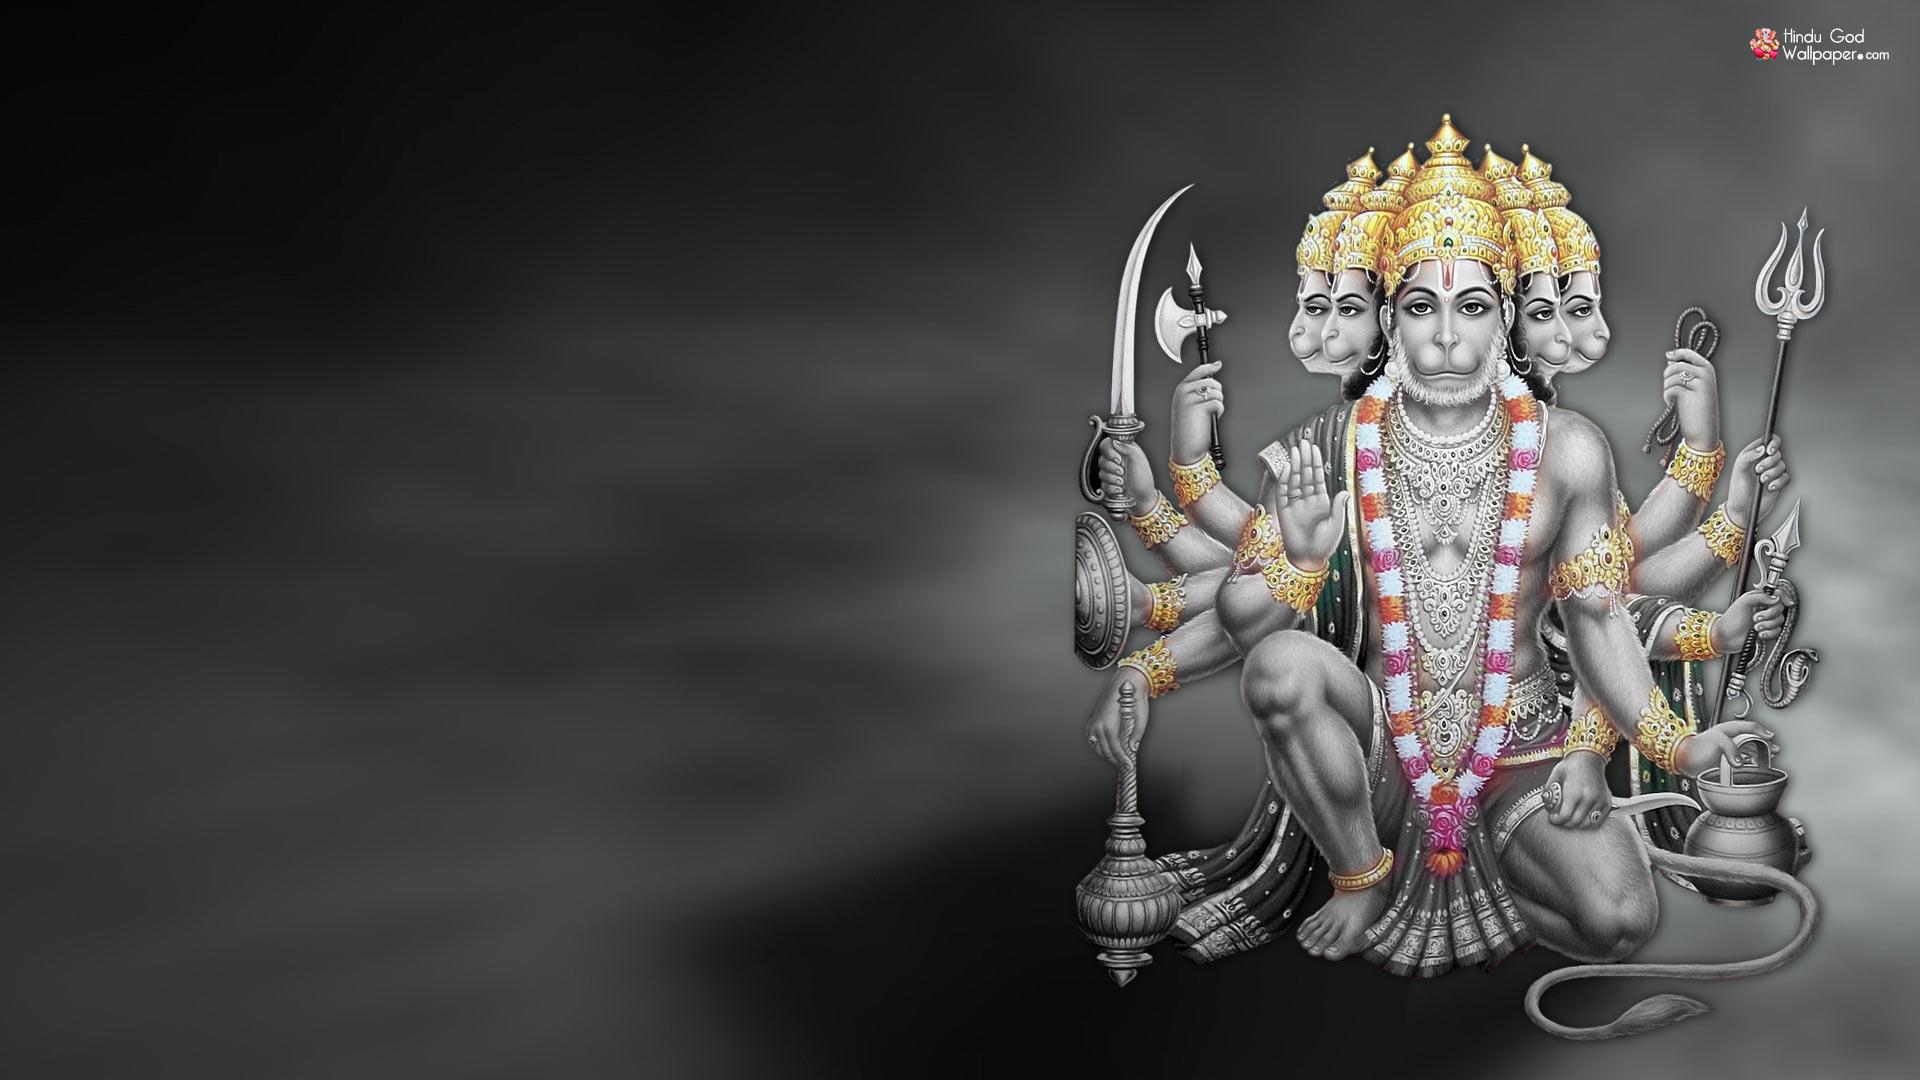 Hindu God Krishna Wallpaper 3d Black Wallpaper Hd 1080p Full Hd Desktop Widescreen